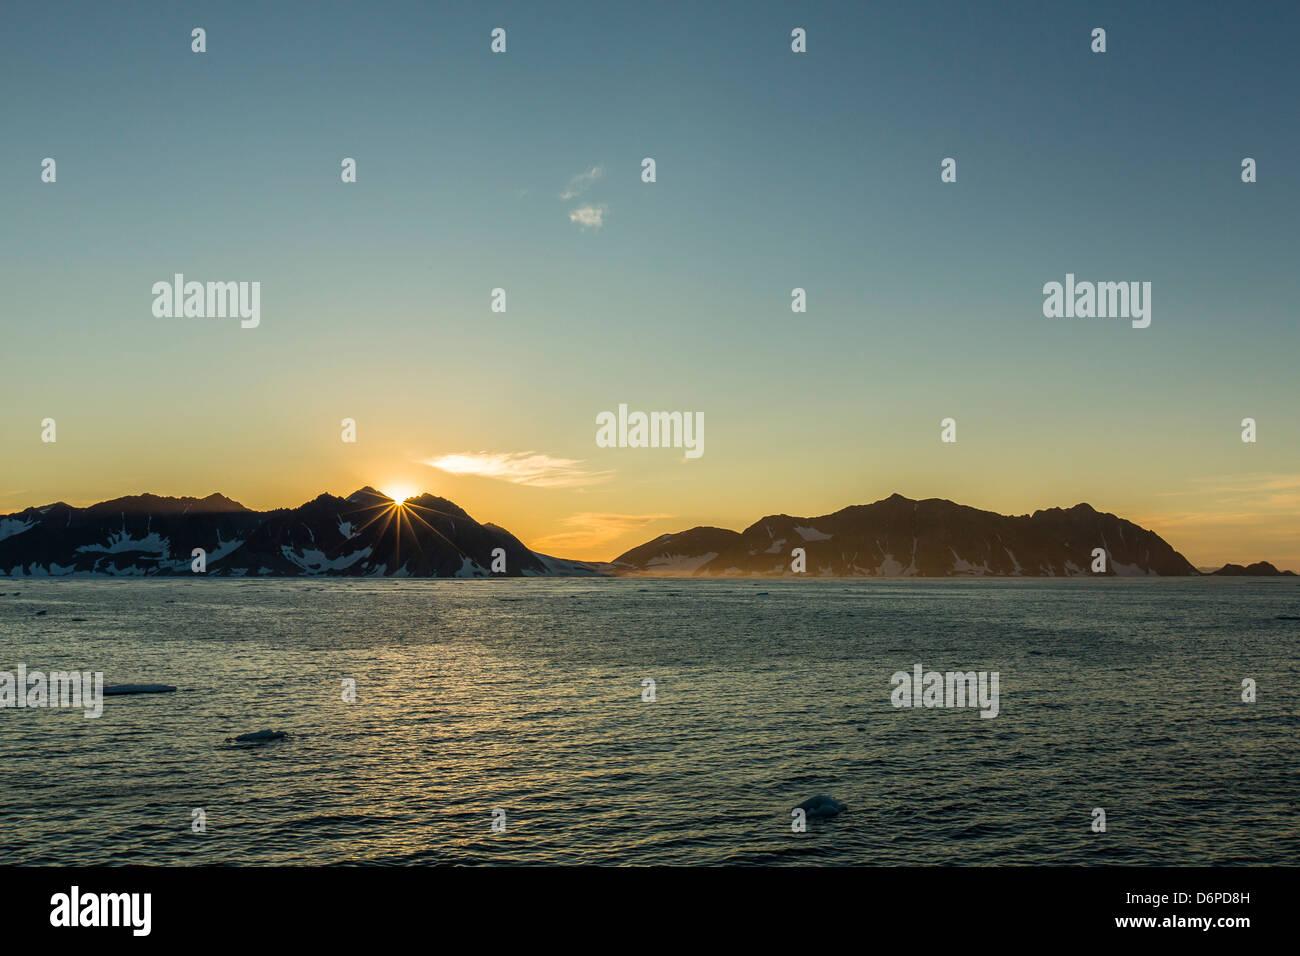 Sonnenuntergang im Kong Oscar Fjord, Nordostgrönland, Polarregionen Stockbild